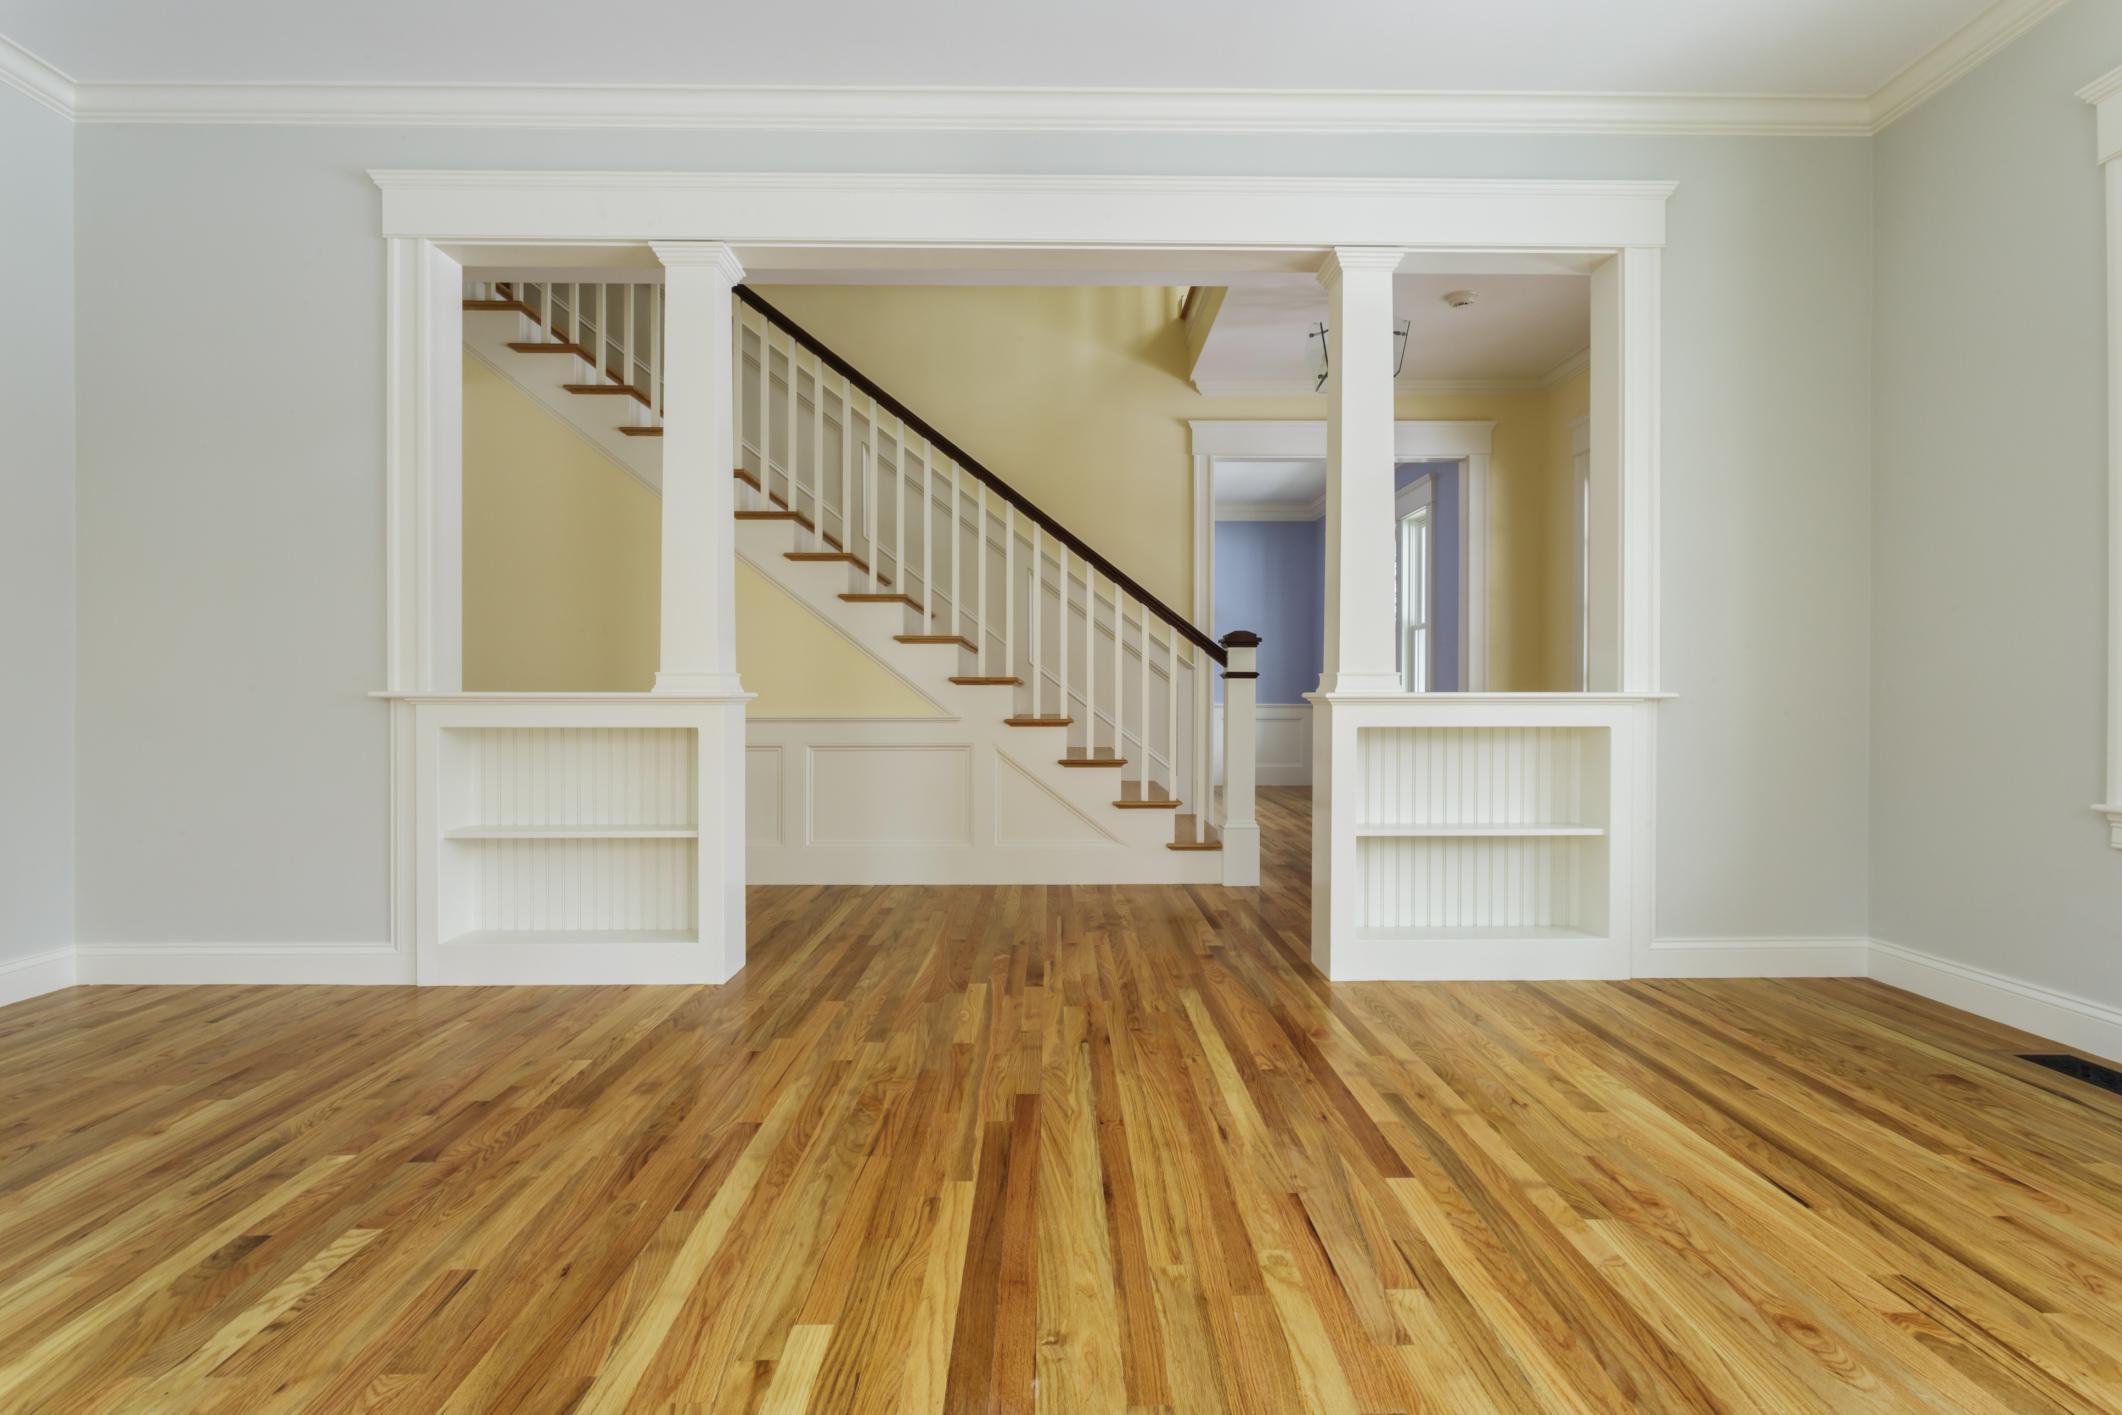 3 4 inch hardwood flooring of guide to solid hardwood floors regarding 168686571 56a49f213df78cf772834e24